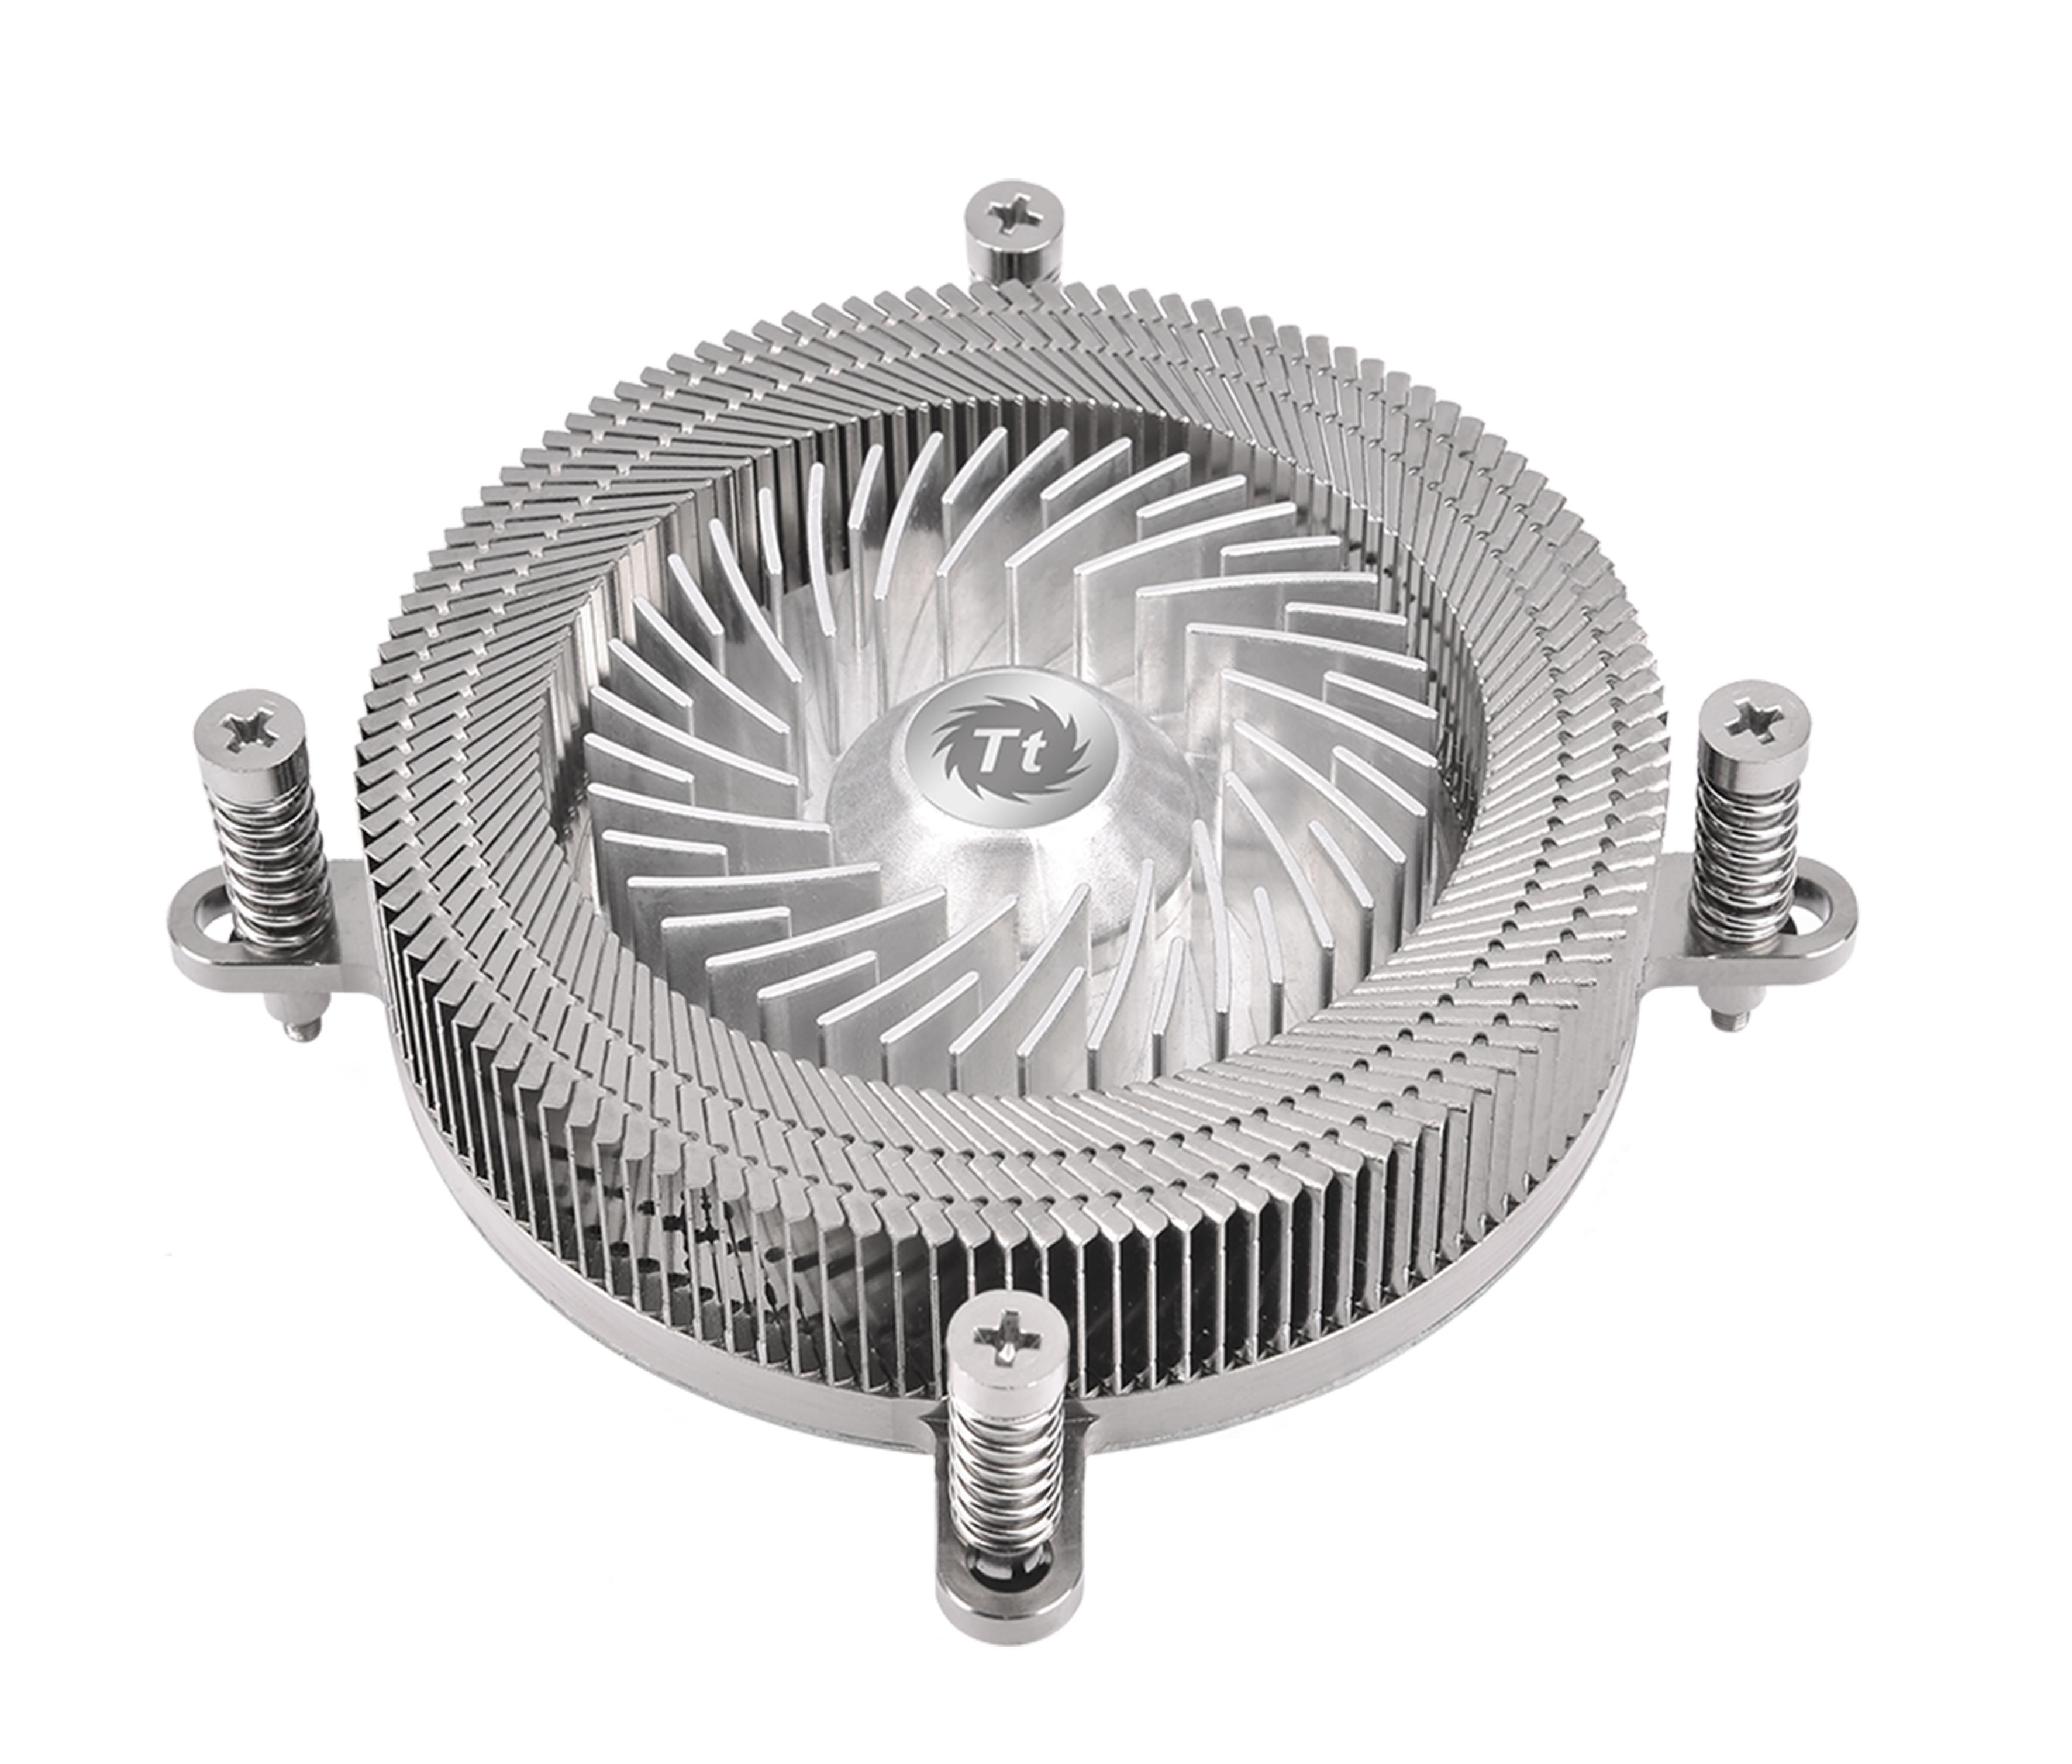 Engine 27 1U Low-Profile CPU Cooler